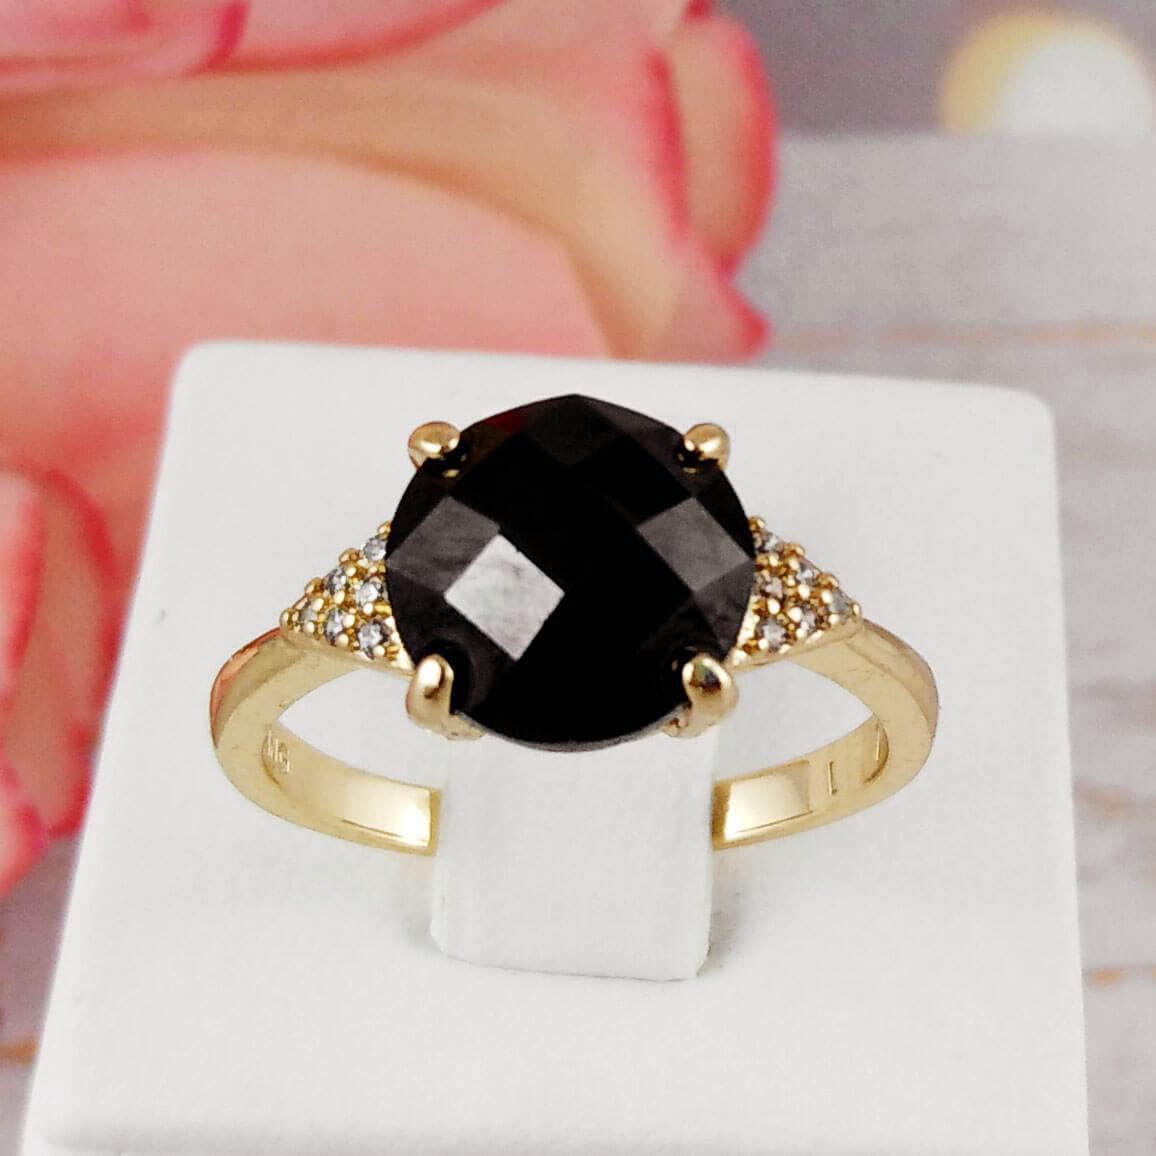 "Кольцо Xuping Jewelry размер 17 ""Эшли"" медицинское золото, позолота 18К. А/В 3577"